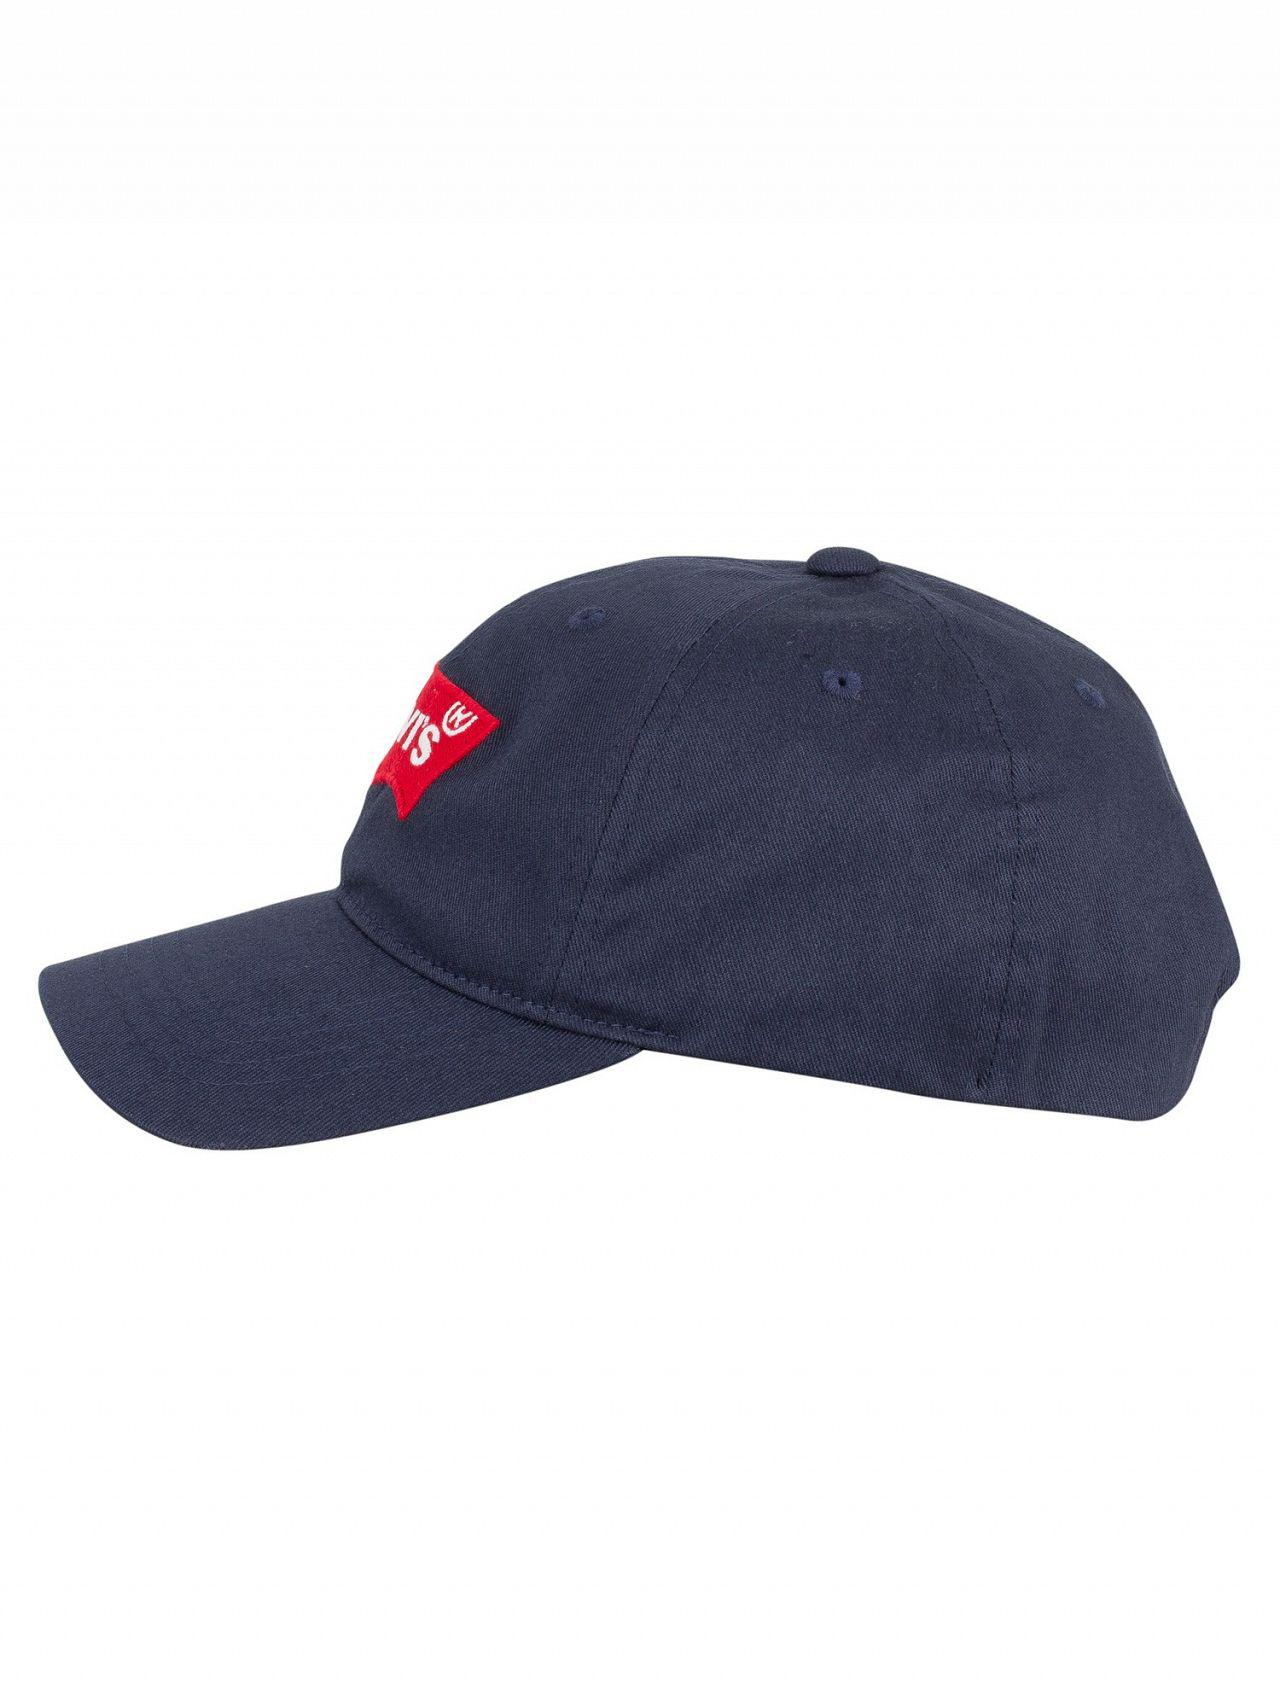 854e0f8e Levi's Navy Batwing Flex Fit Baseball Cap in Blue for Men - Lyst